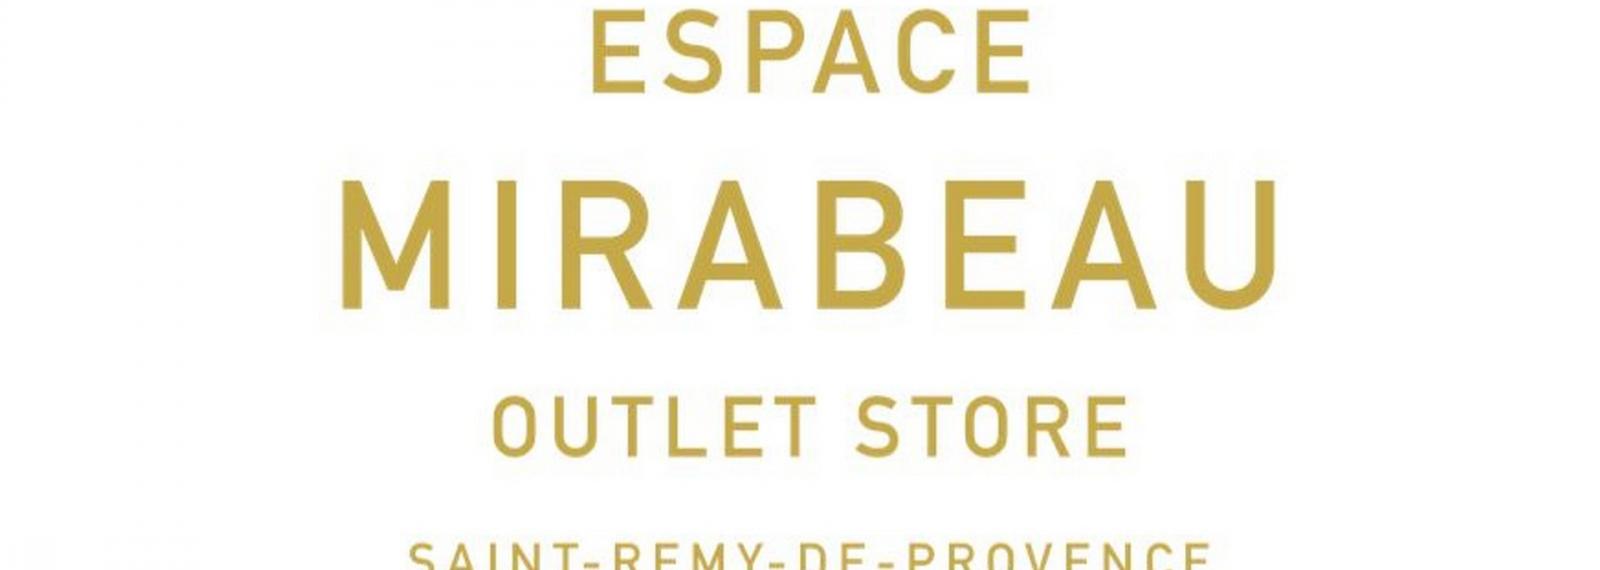 Espace Mirabeau